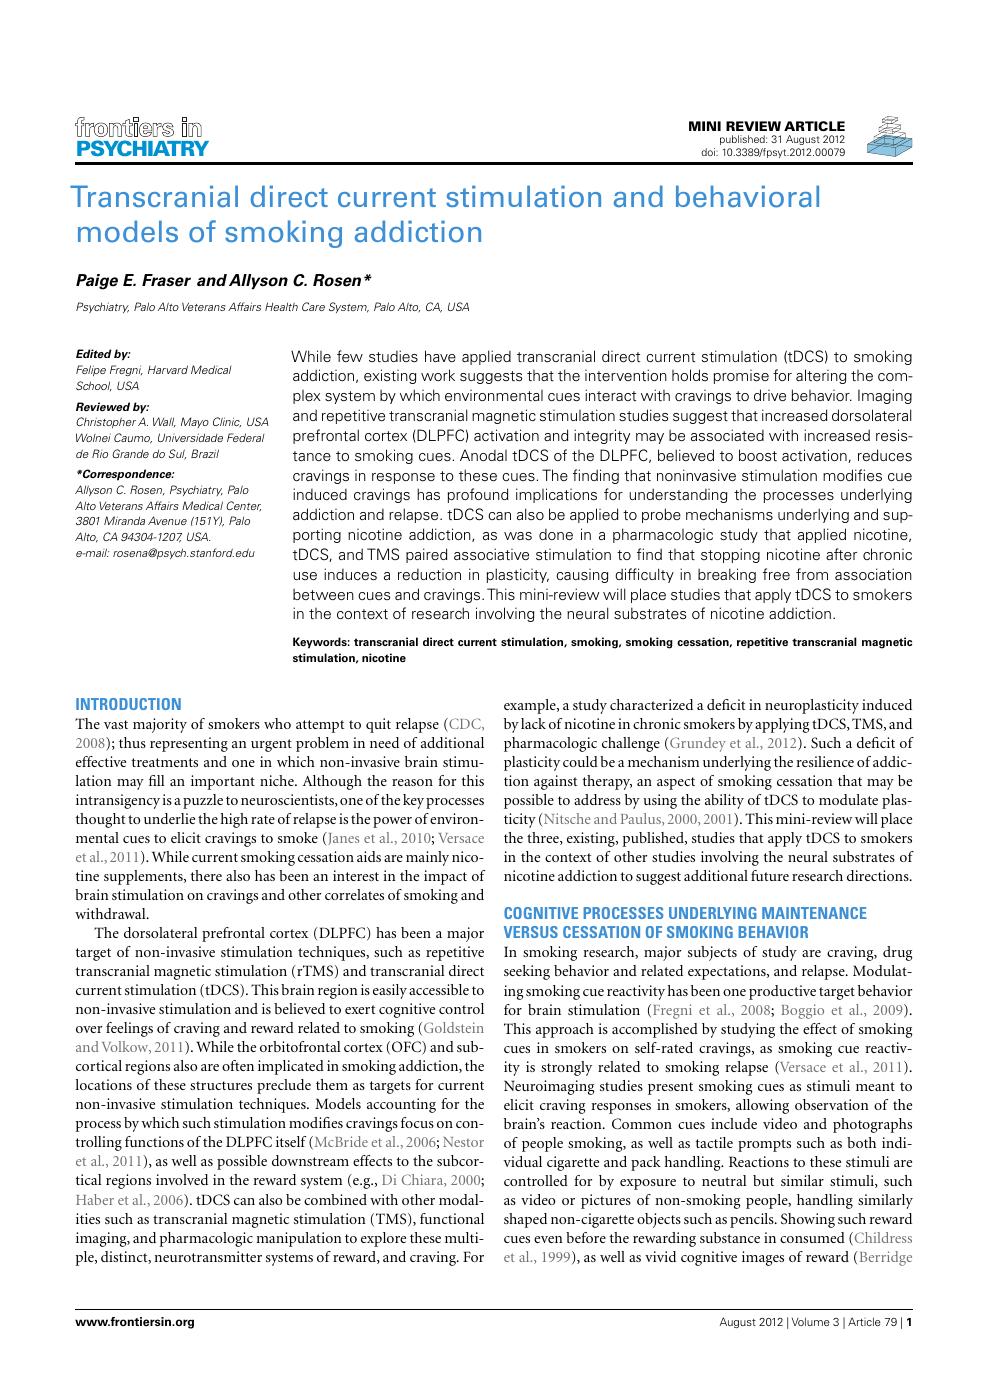 Transcranial Direct Current Stimulation and Behavioral Models of